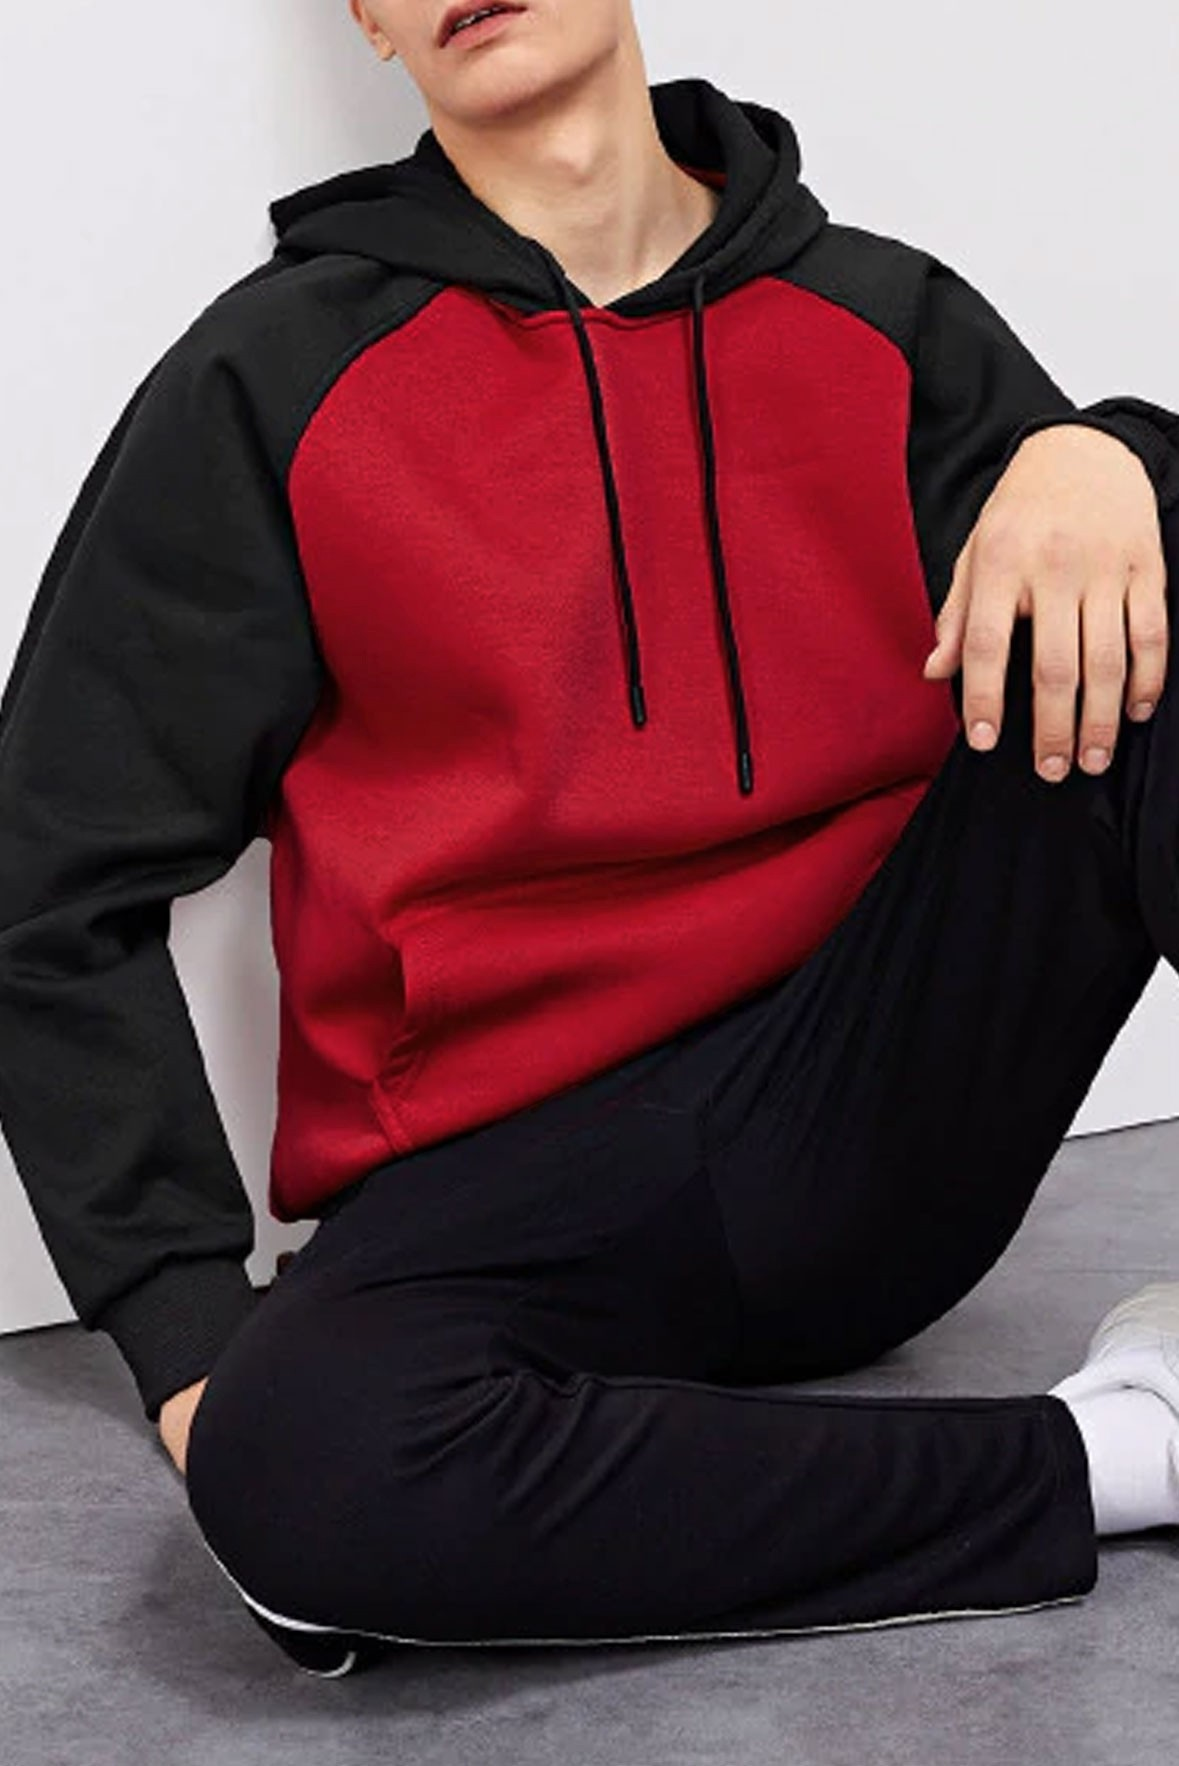 Red and Black Hoodie